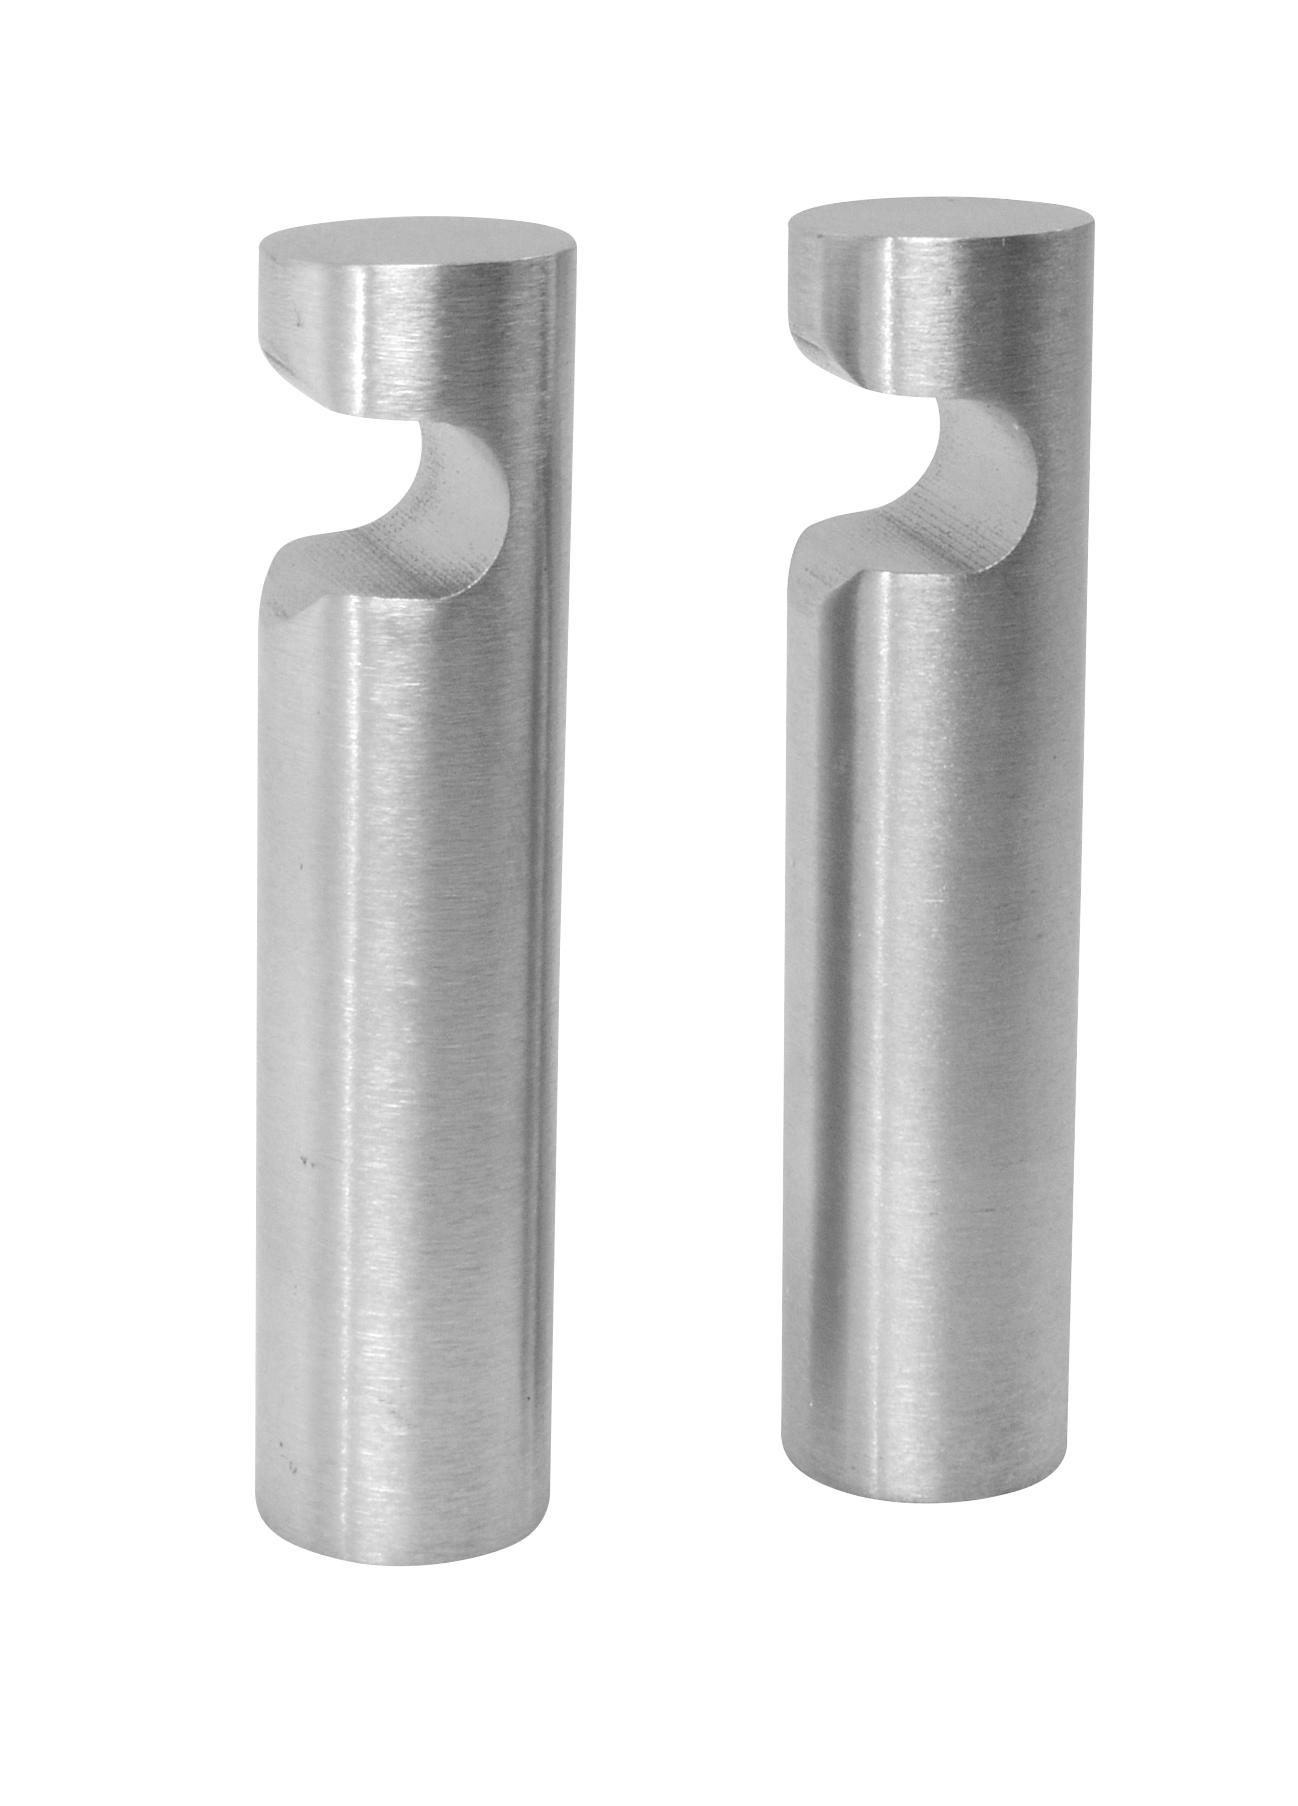 Image of   Klædekroge 2 stk. 60 mm. - rustfri stål